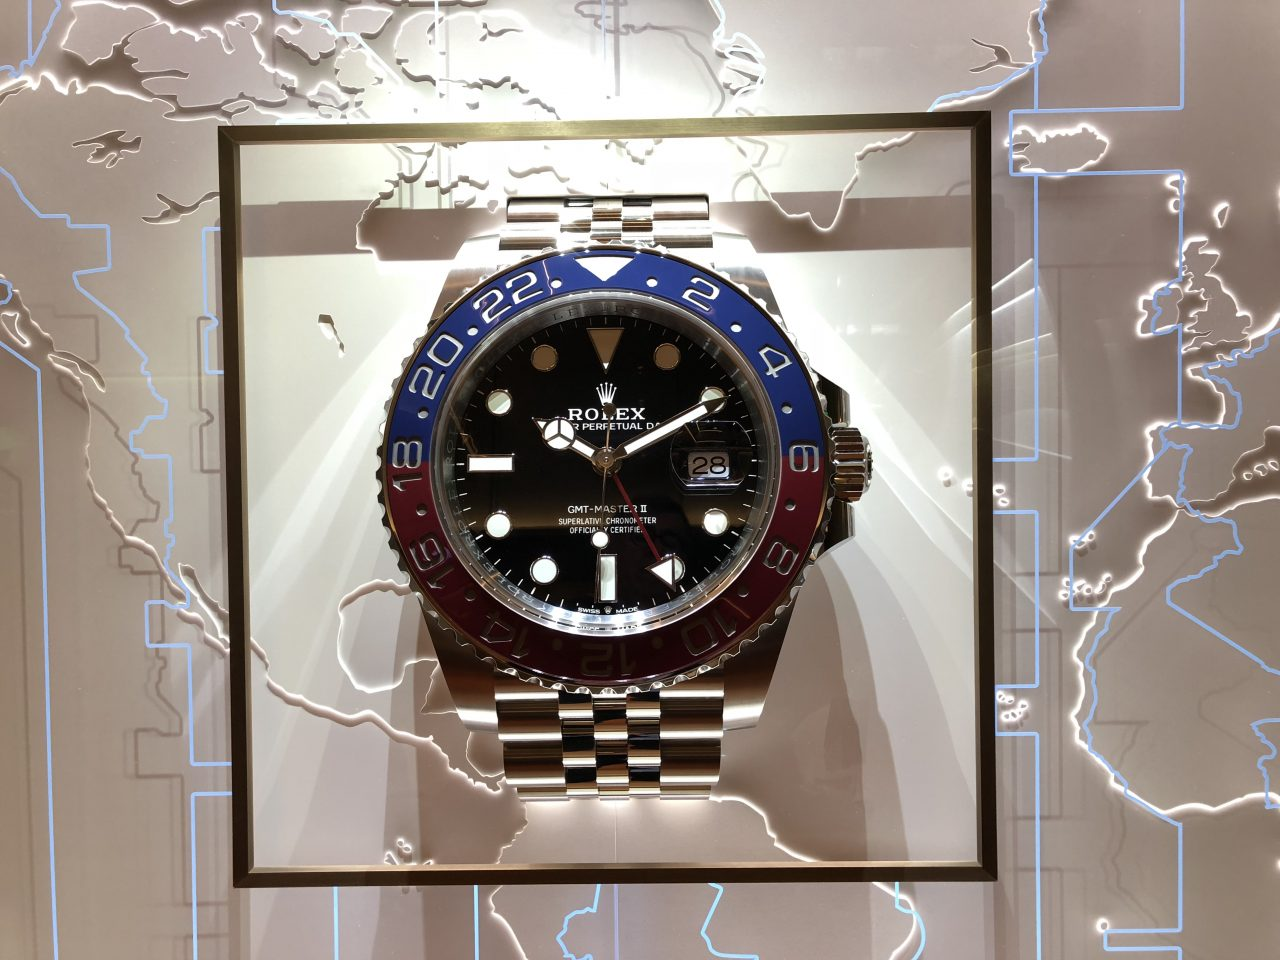 Chronometer der Superlative